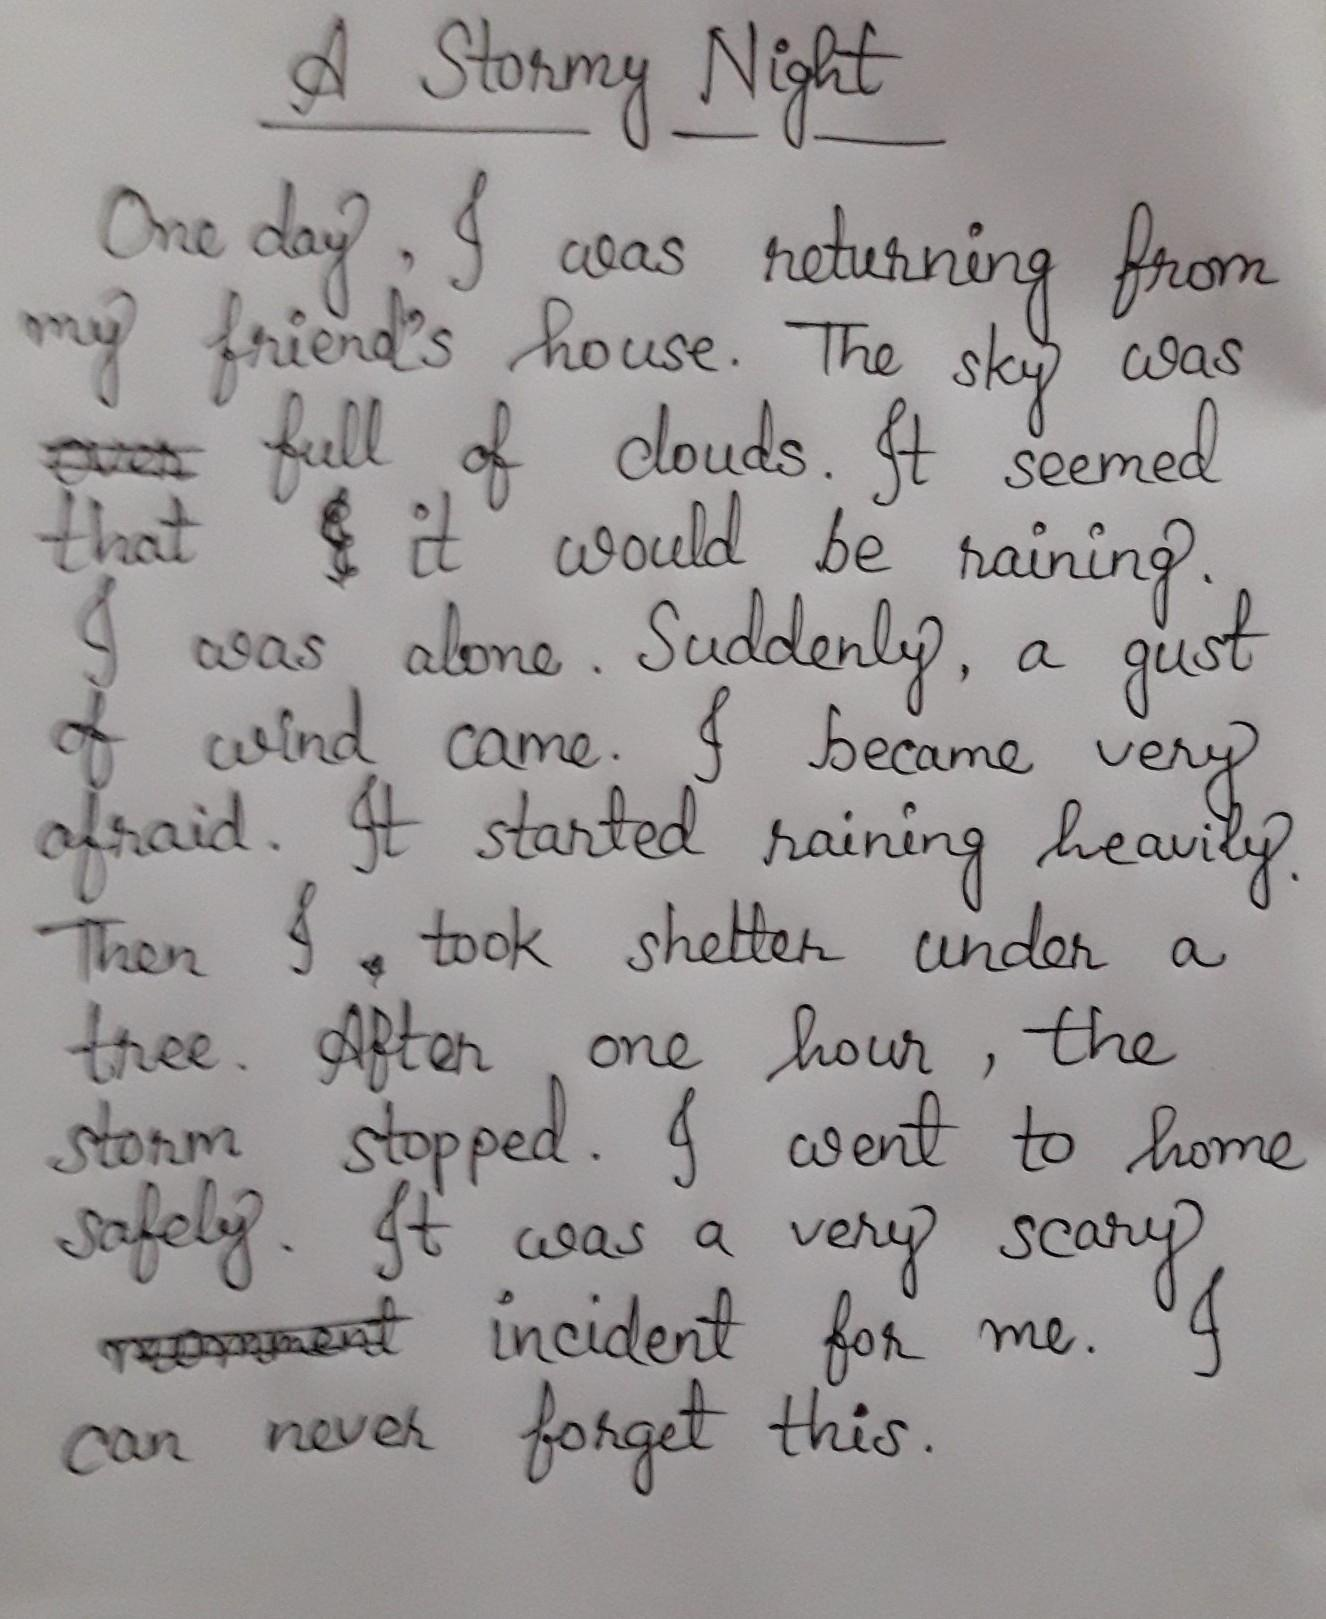 a stormy night descriptive essay